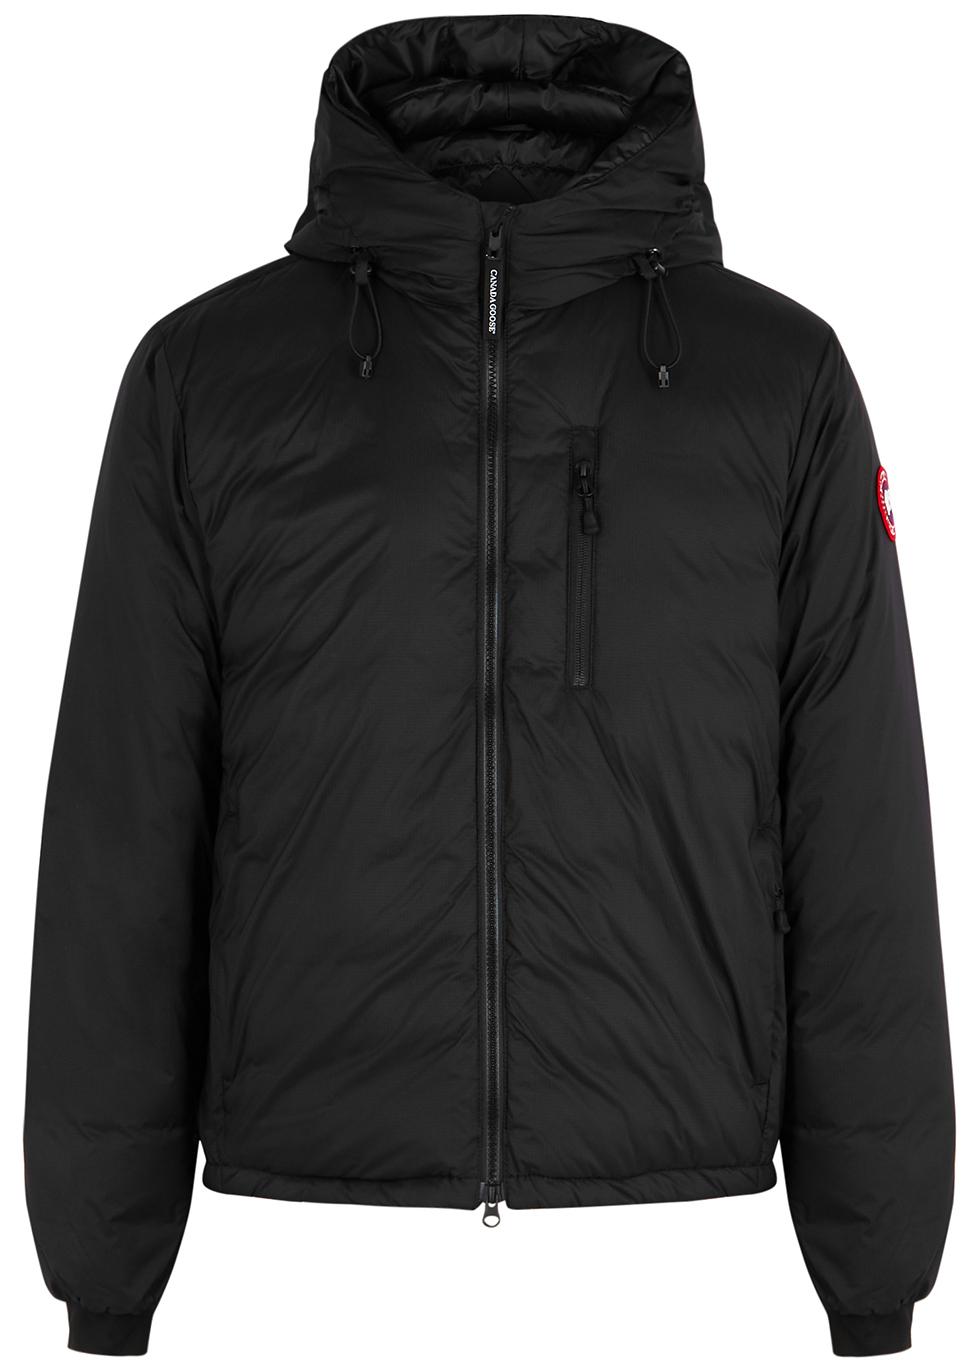 Lodge black padded ripstop shell jacket